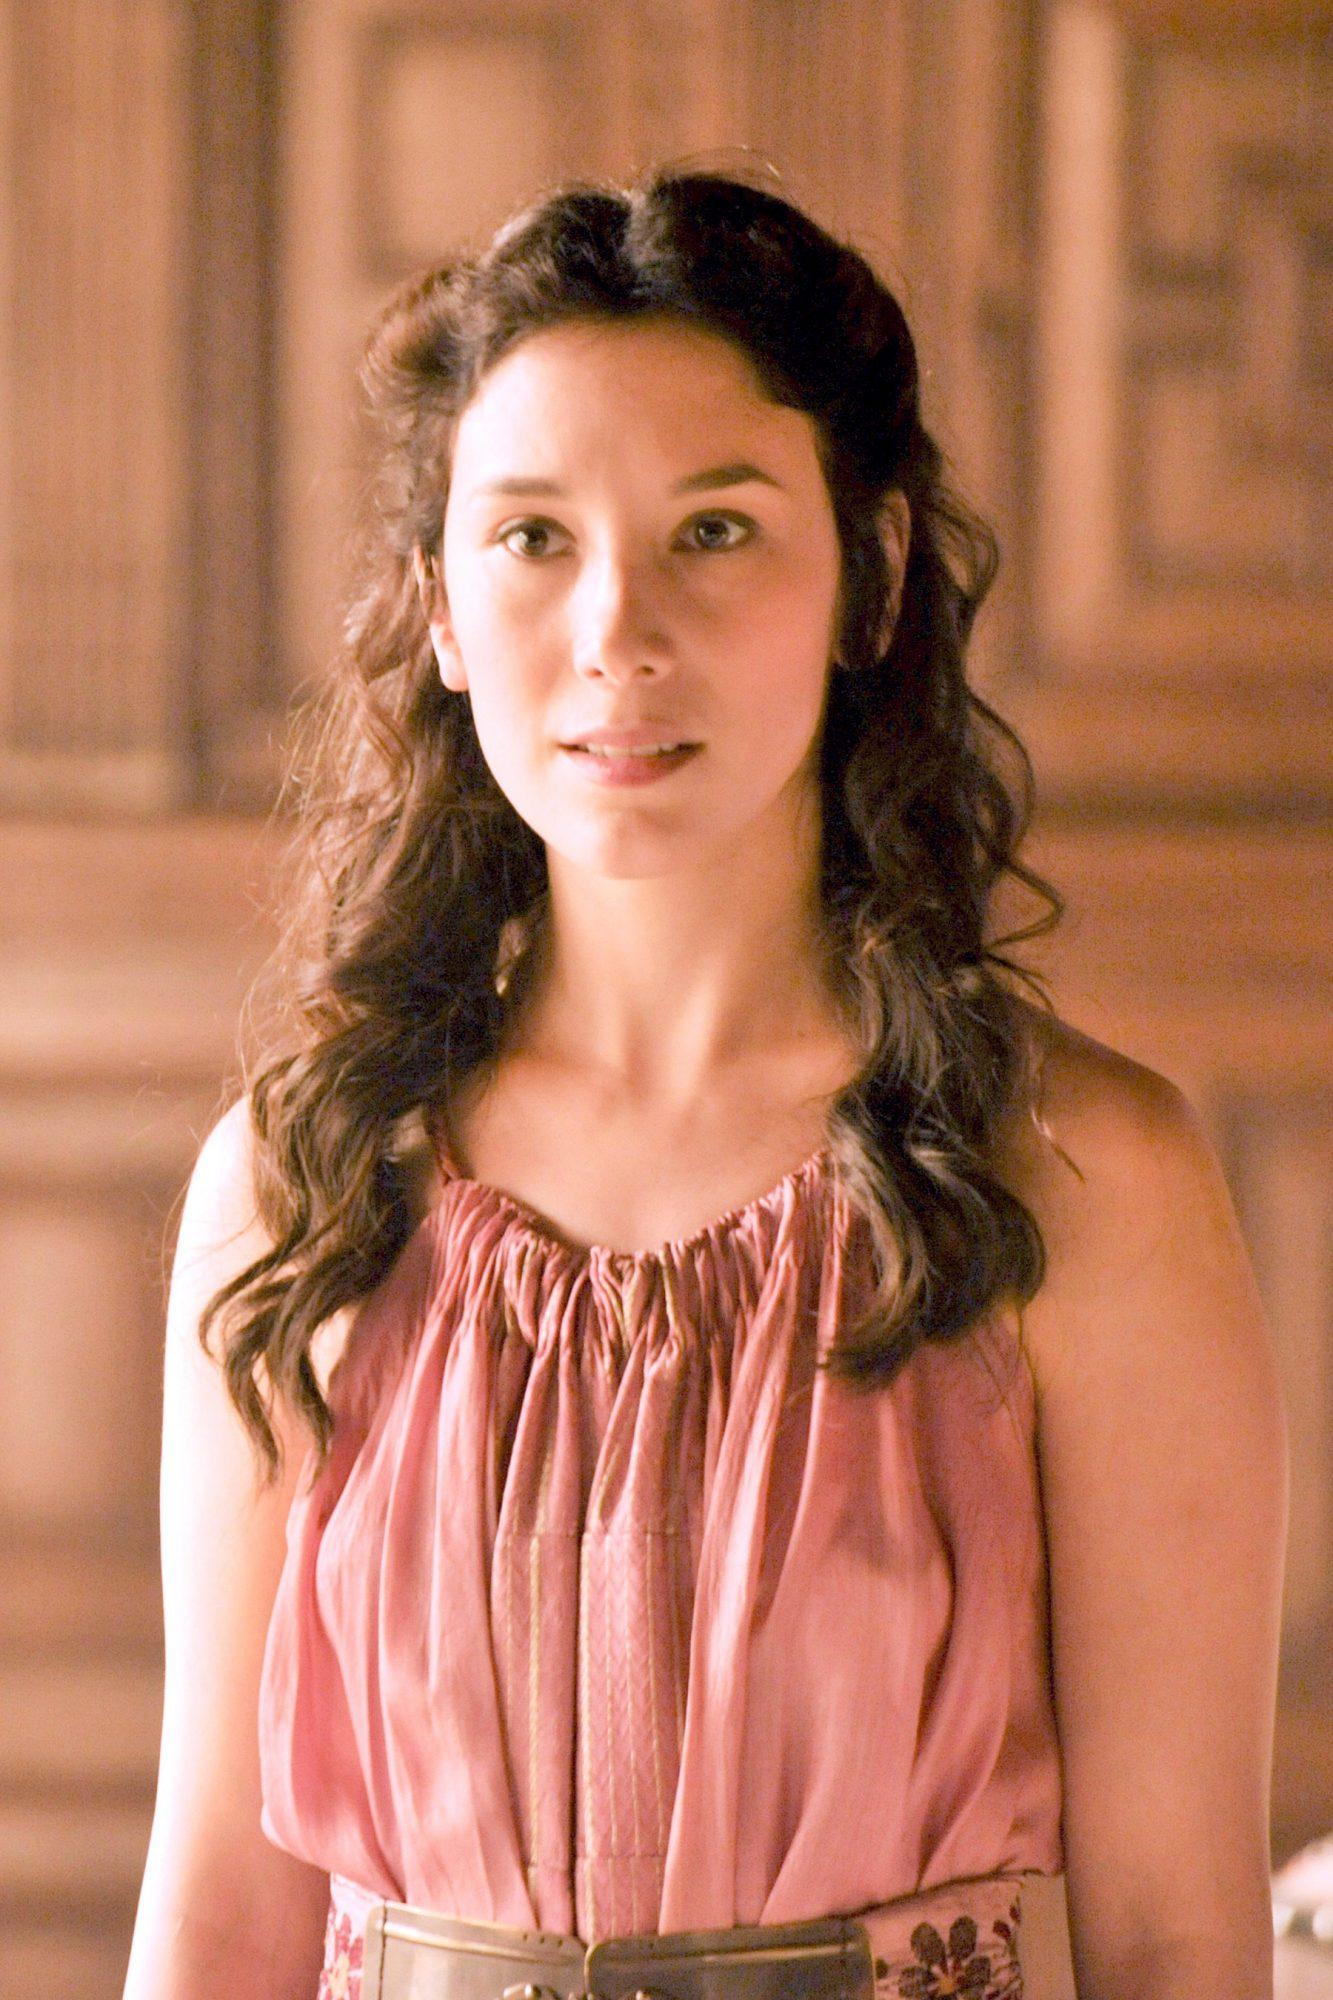 GAME OF THRONES season 4: Sibel Kekilli.photo: Neil Davidson